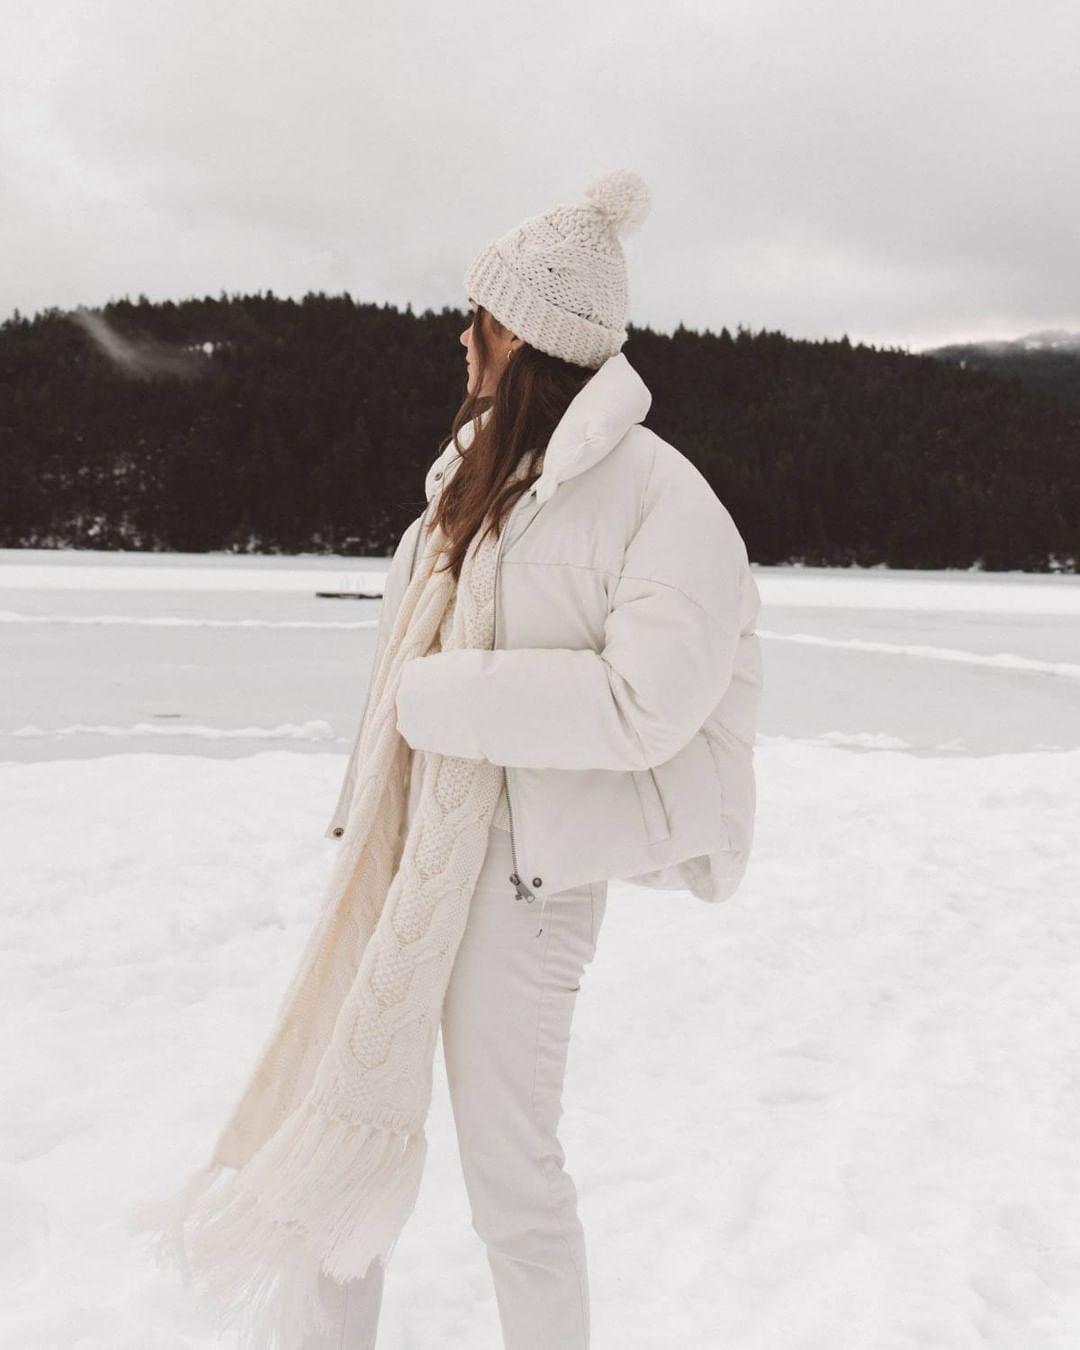 Winter White Ski Trip Outfit Ski Trip Outfit Puffer Jackets Warm Outerwear [ 1350 x 1080 Pixel ]